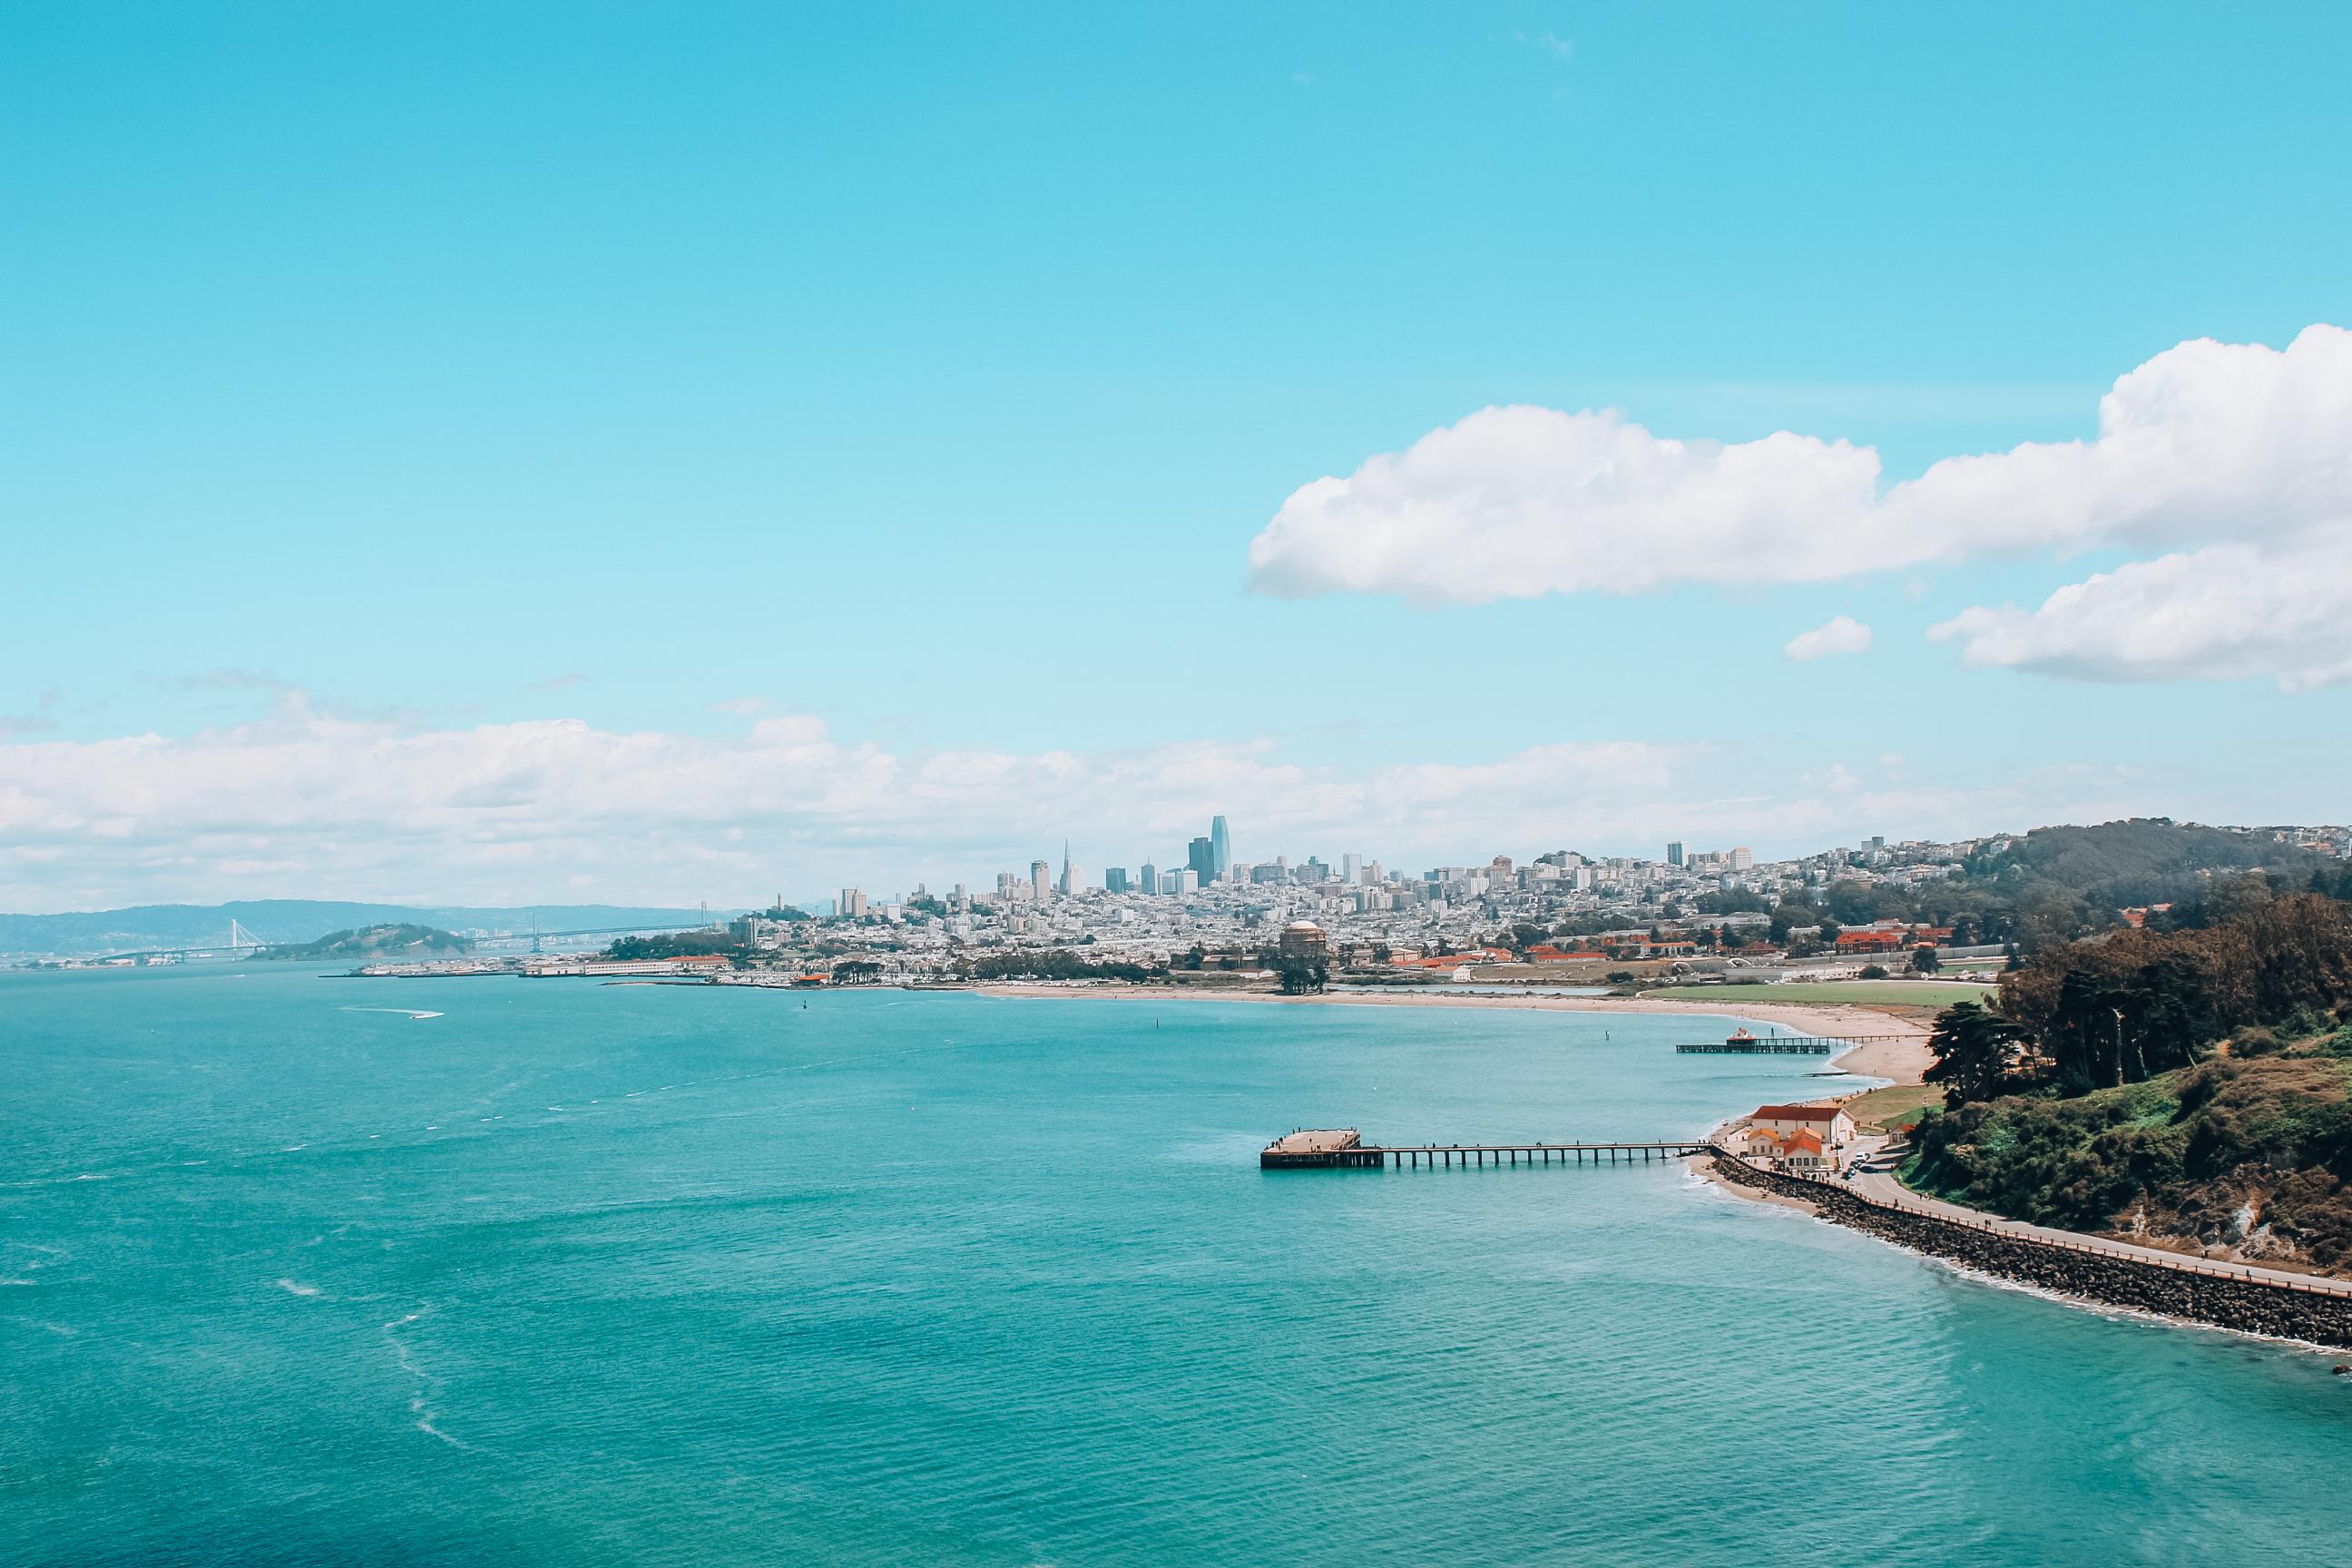 San Francisco 48 h Städtetrip: Auto oder Fahrrad?